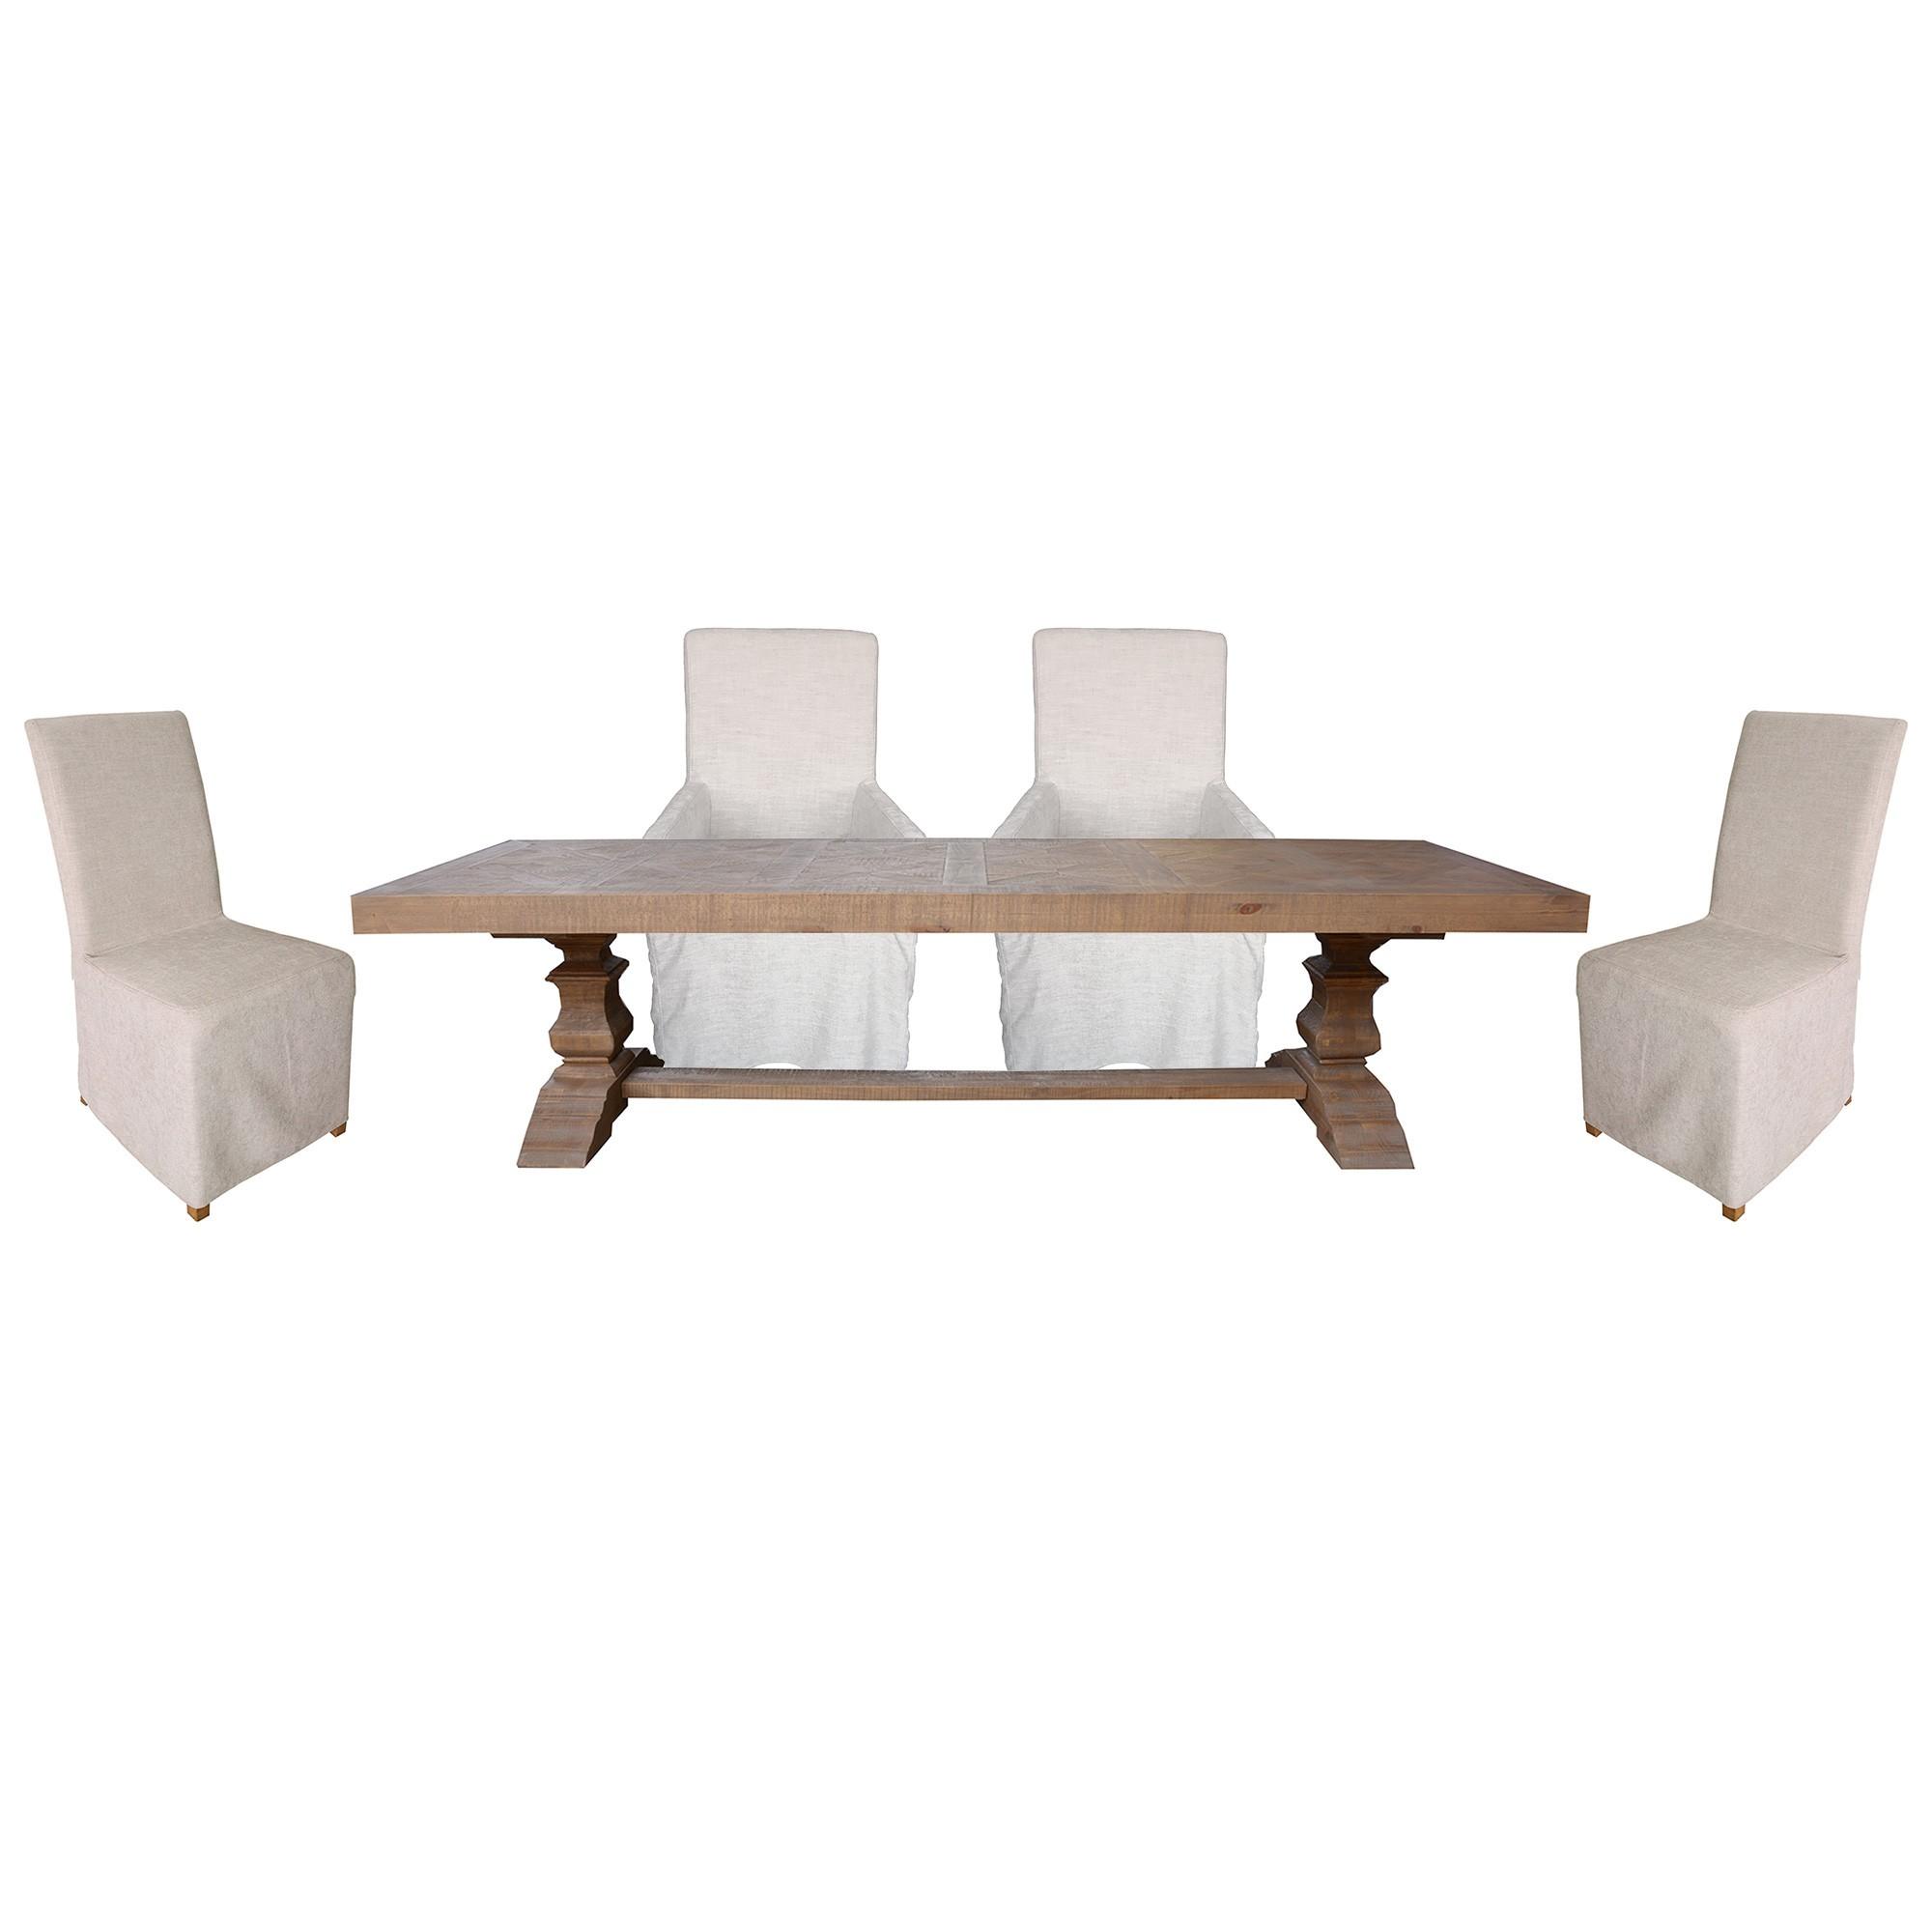 Cognac 11 Piece Pine Timber Trestle Dining Table Set, 305cm